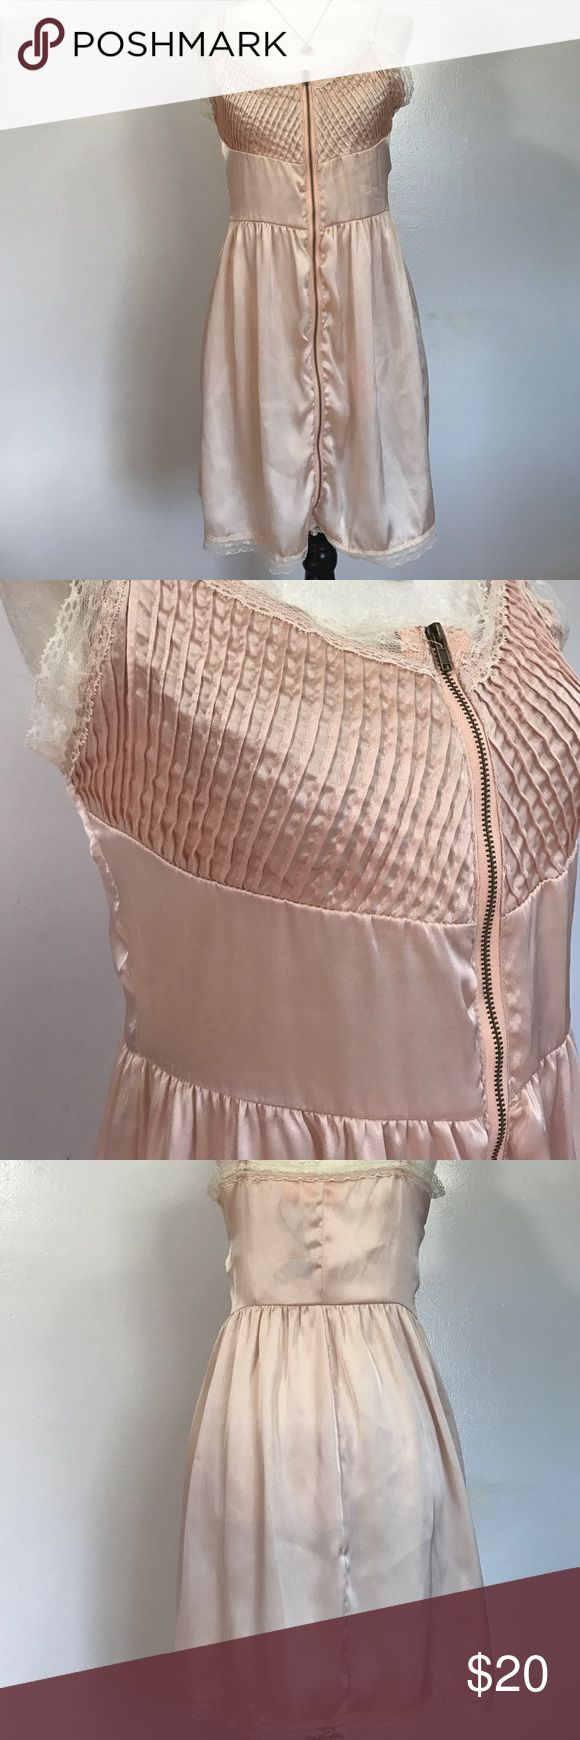 Urban Behavior Apricot Lane Zippered Dress- Med Lovely dusty pink polyester dress that honestly feels like pure silk! Lightweight, & falls beautifully- adjustable spaghetti straps & full front zipper for that fabulous edgy look💞 Urban Behavior Dresses Mini